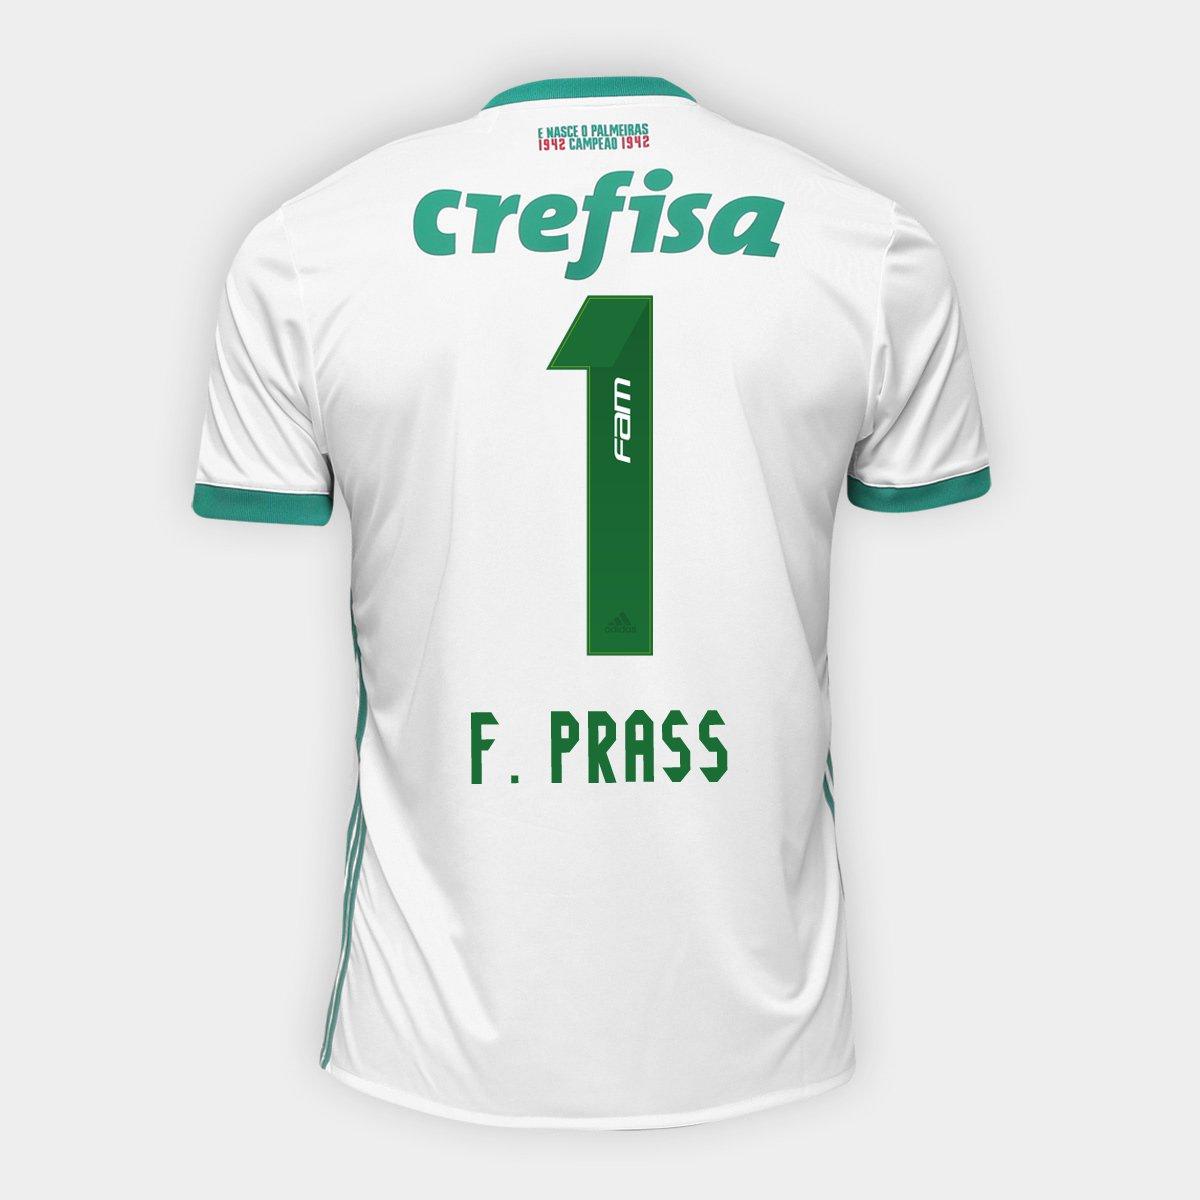 8a52522d088bc Camisa Palmeiras II 17 18 nº 1 - F. Prass Torcedor Adidas Masculina -  Compre Agora